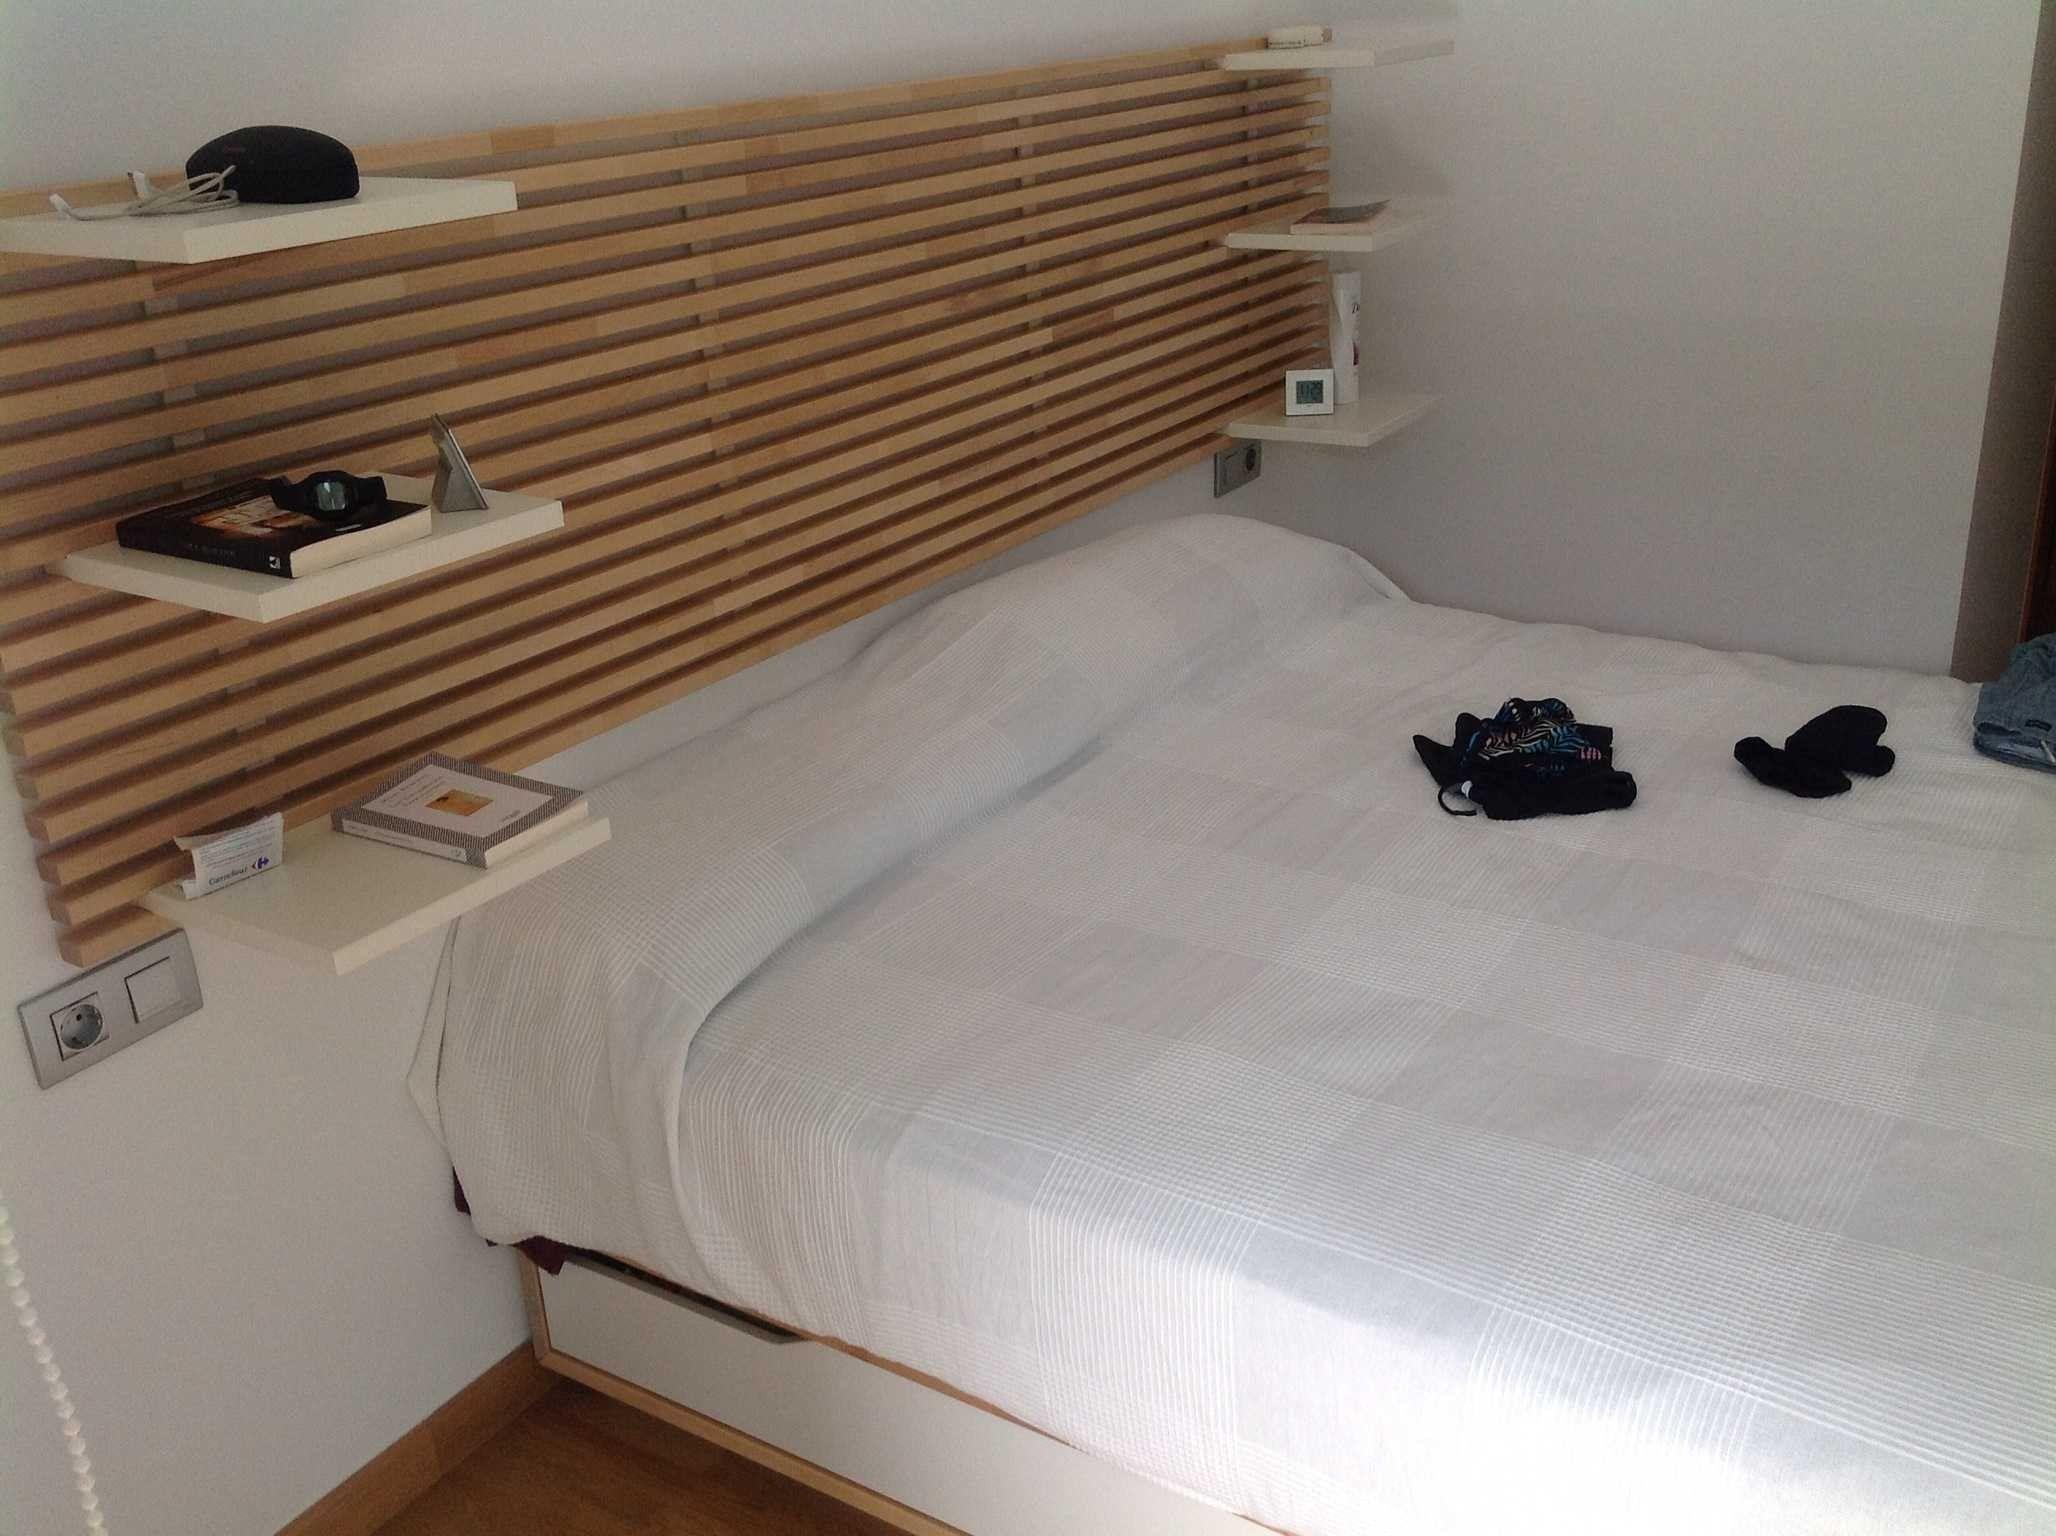 Tete De Lit Ikea Bois tete de lit mandal ikea lit mandal luxe superb lit en ikea